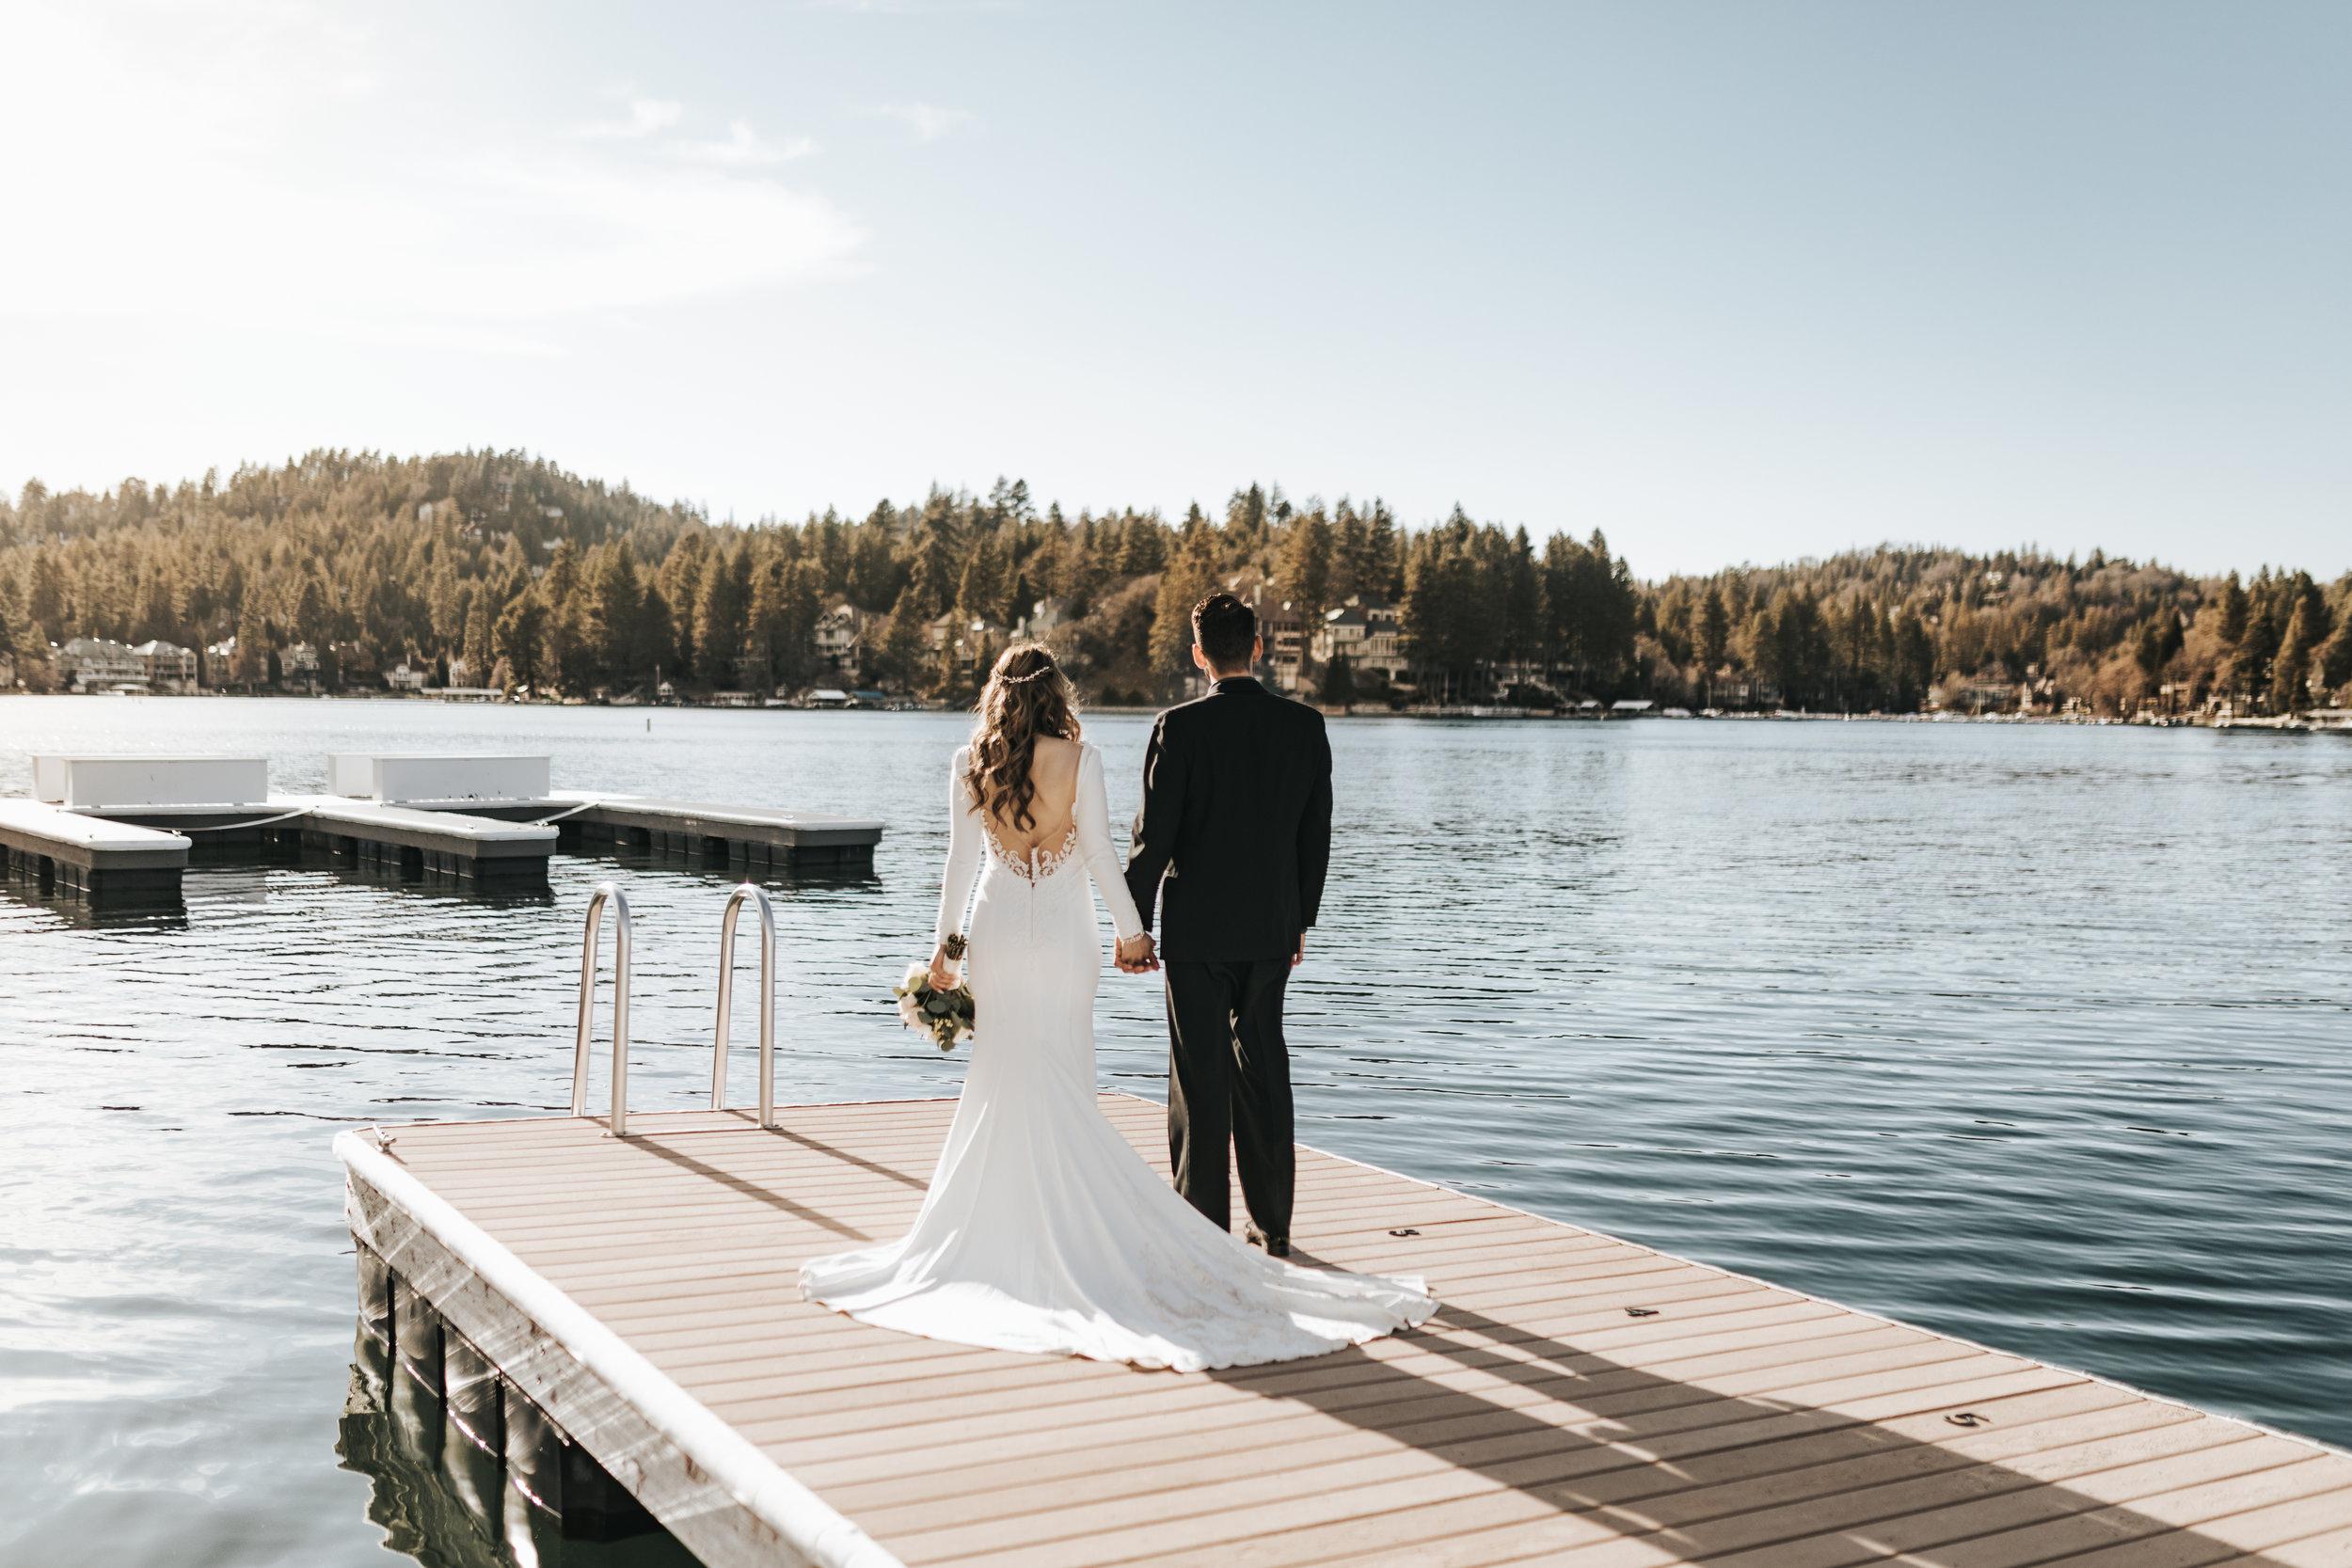 K+K Lake arrowhead intimate wedding (20).jpg